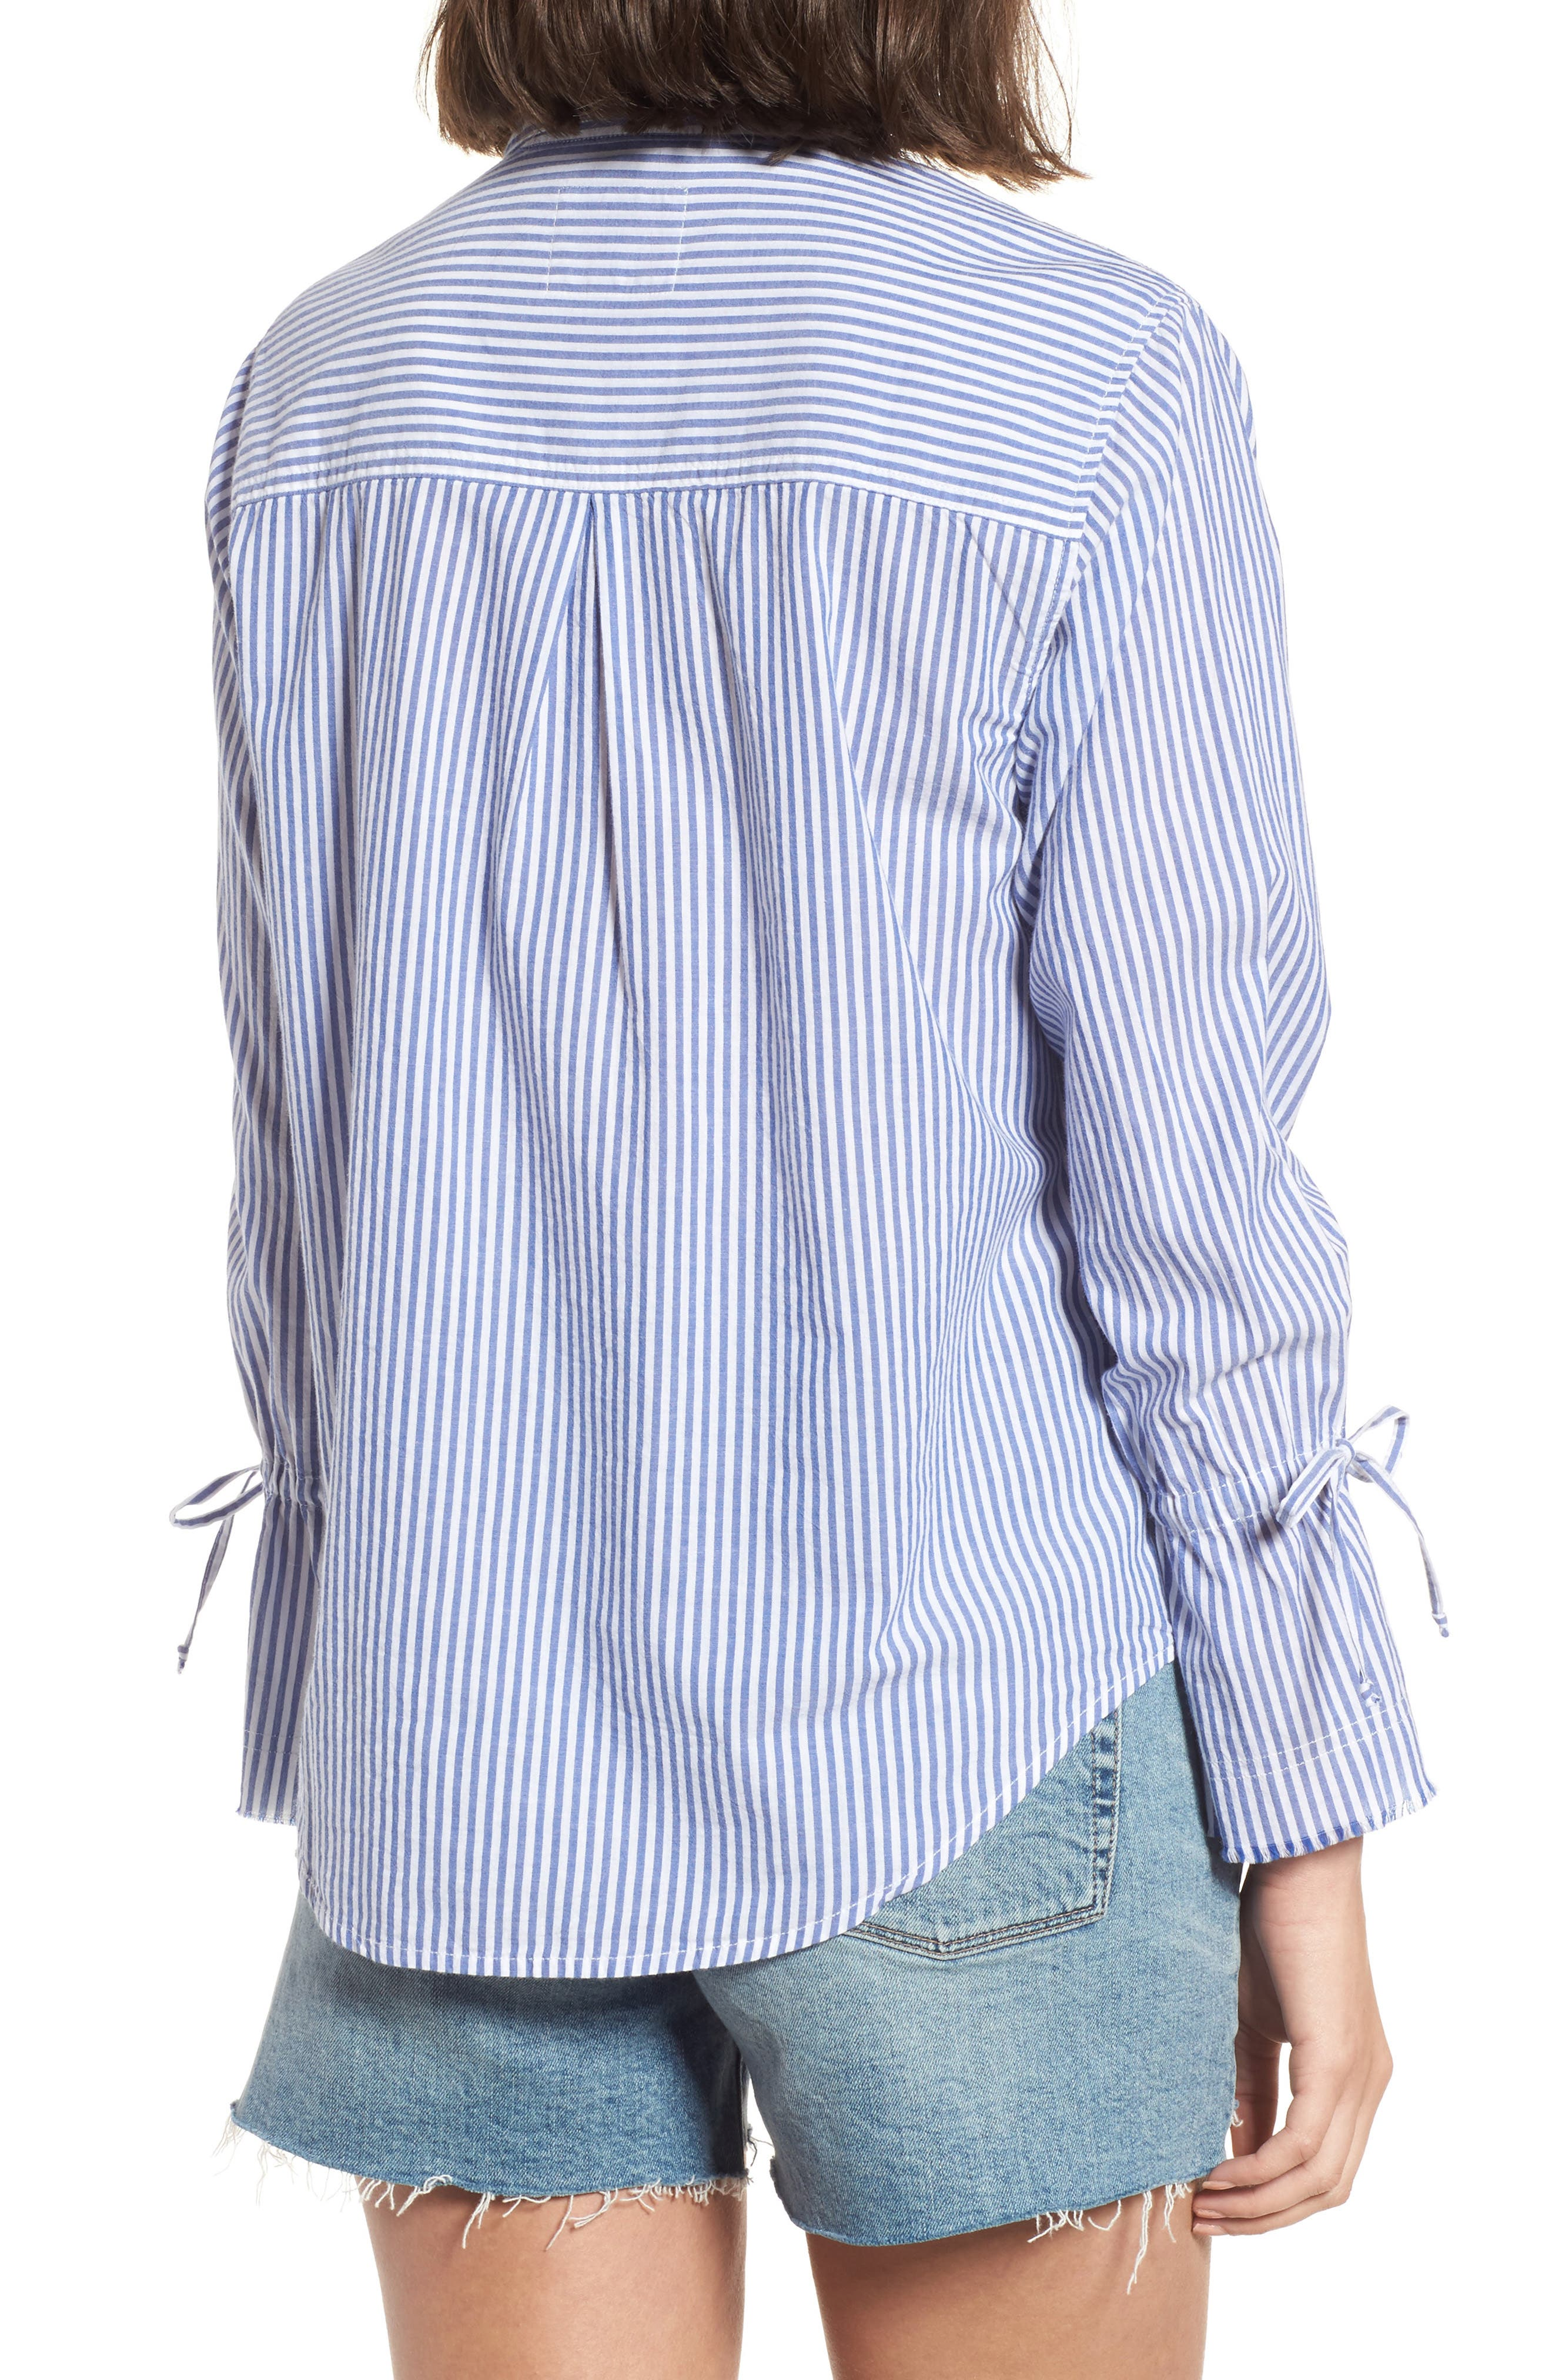 Astrid Tie Cuff Shirt,                             Alternate thumbnail 2, color,                             402